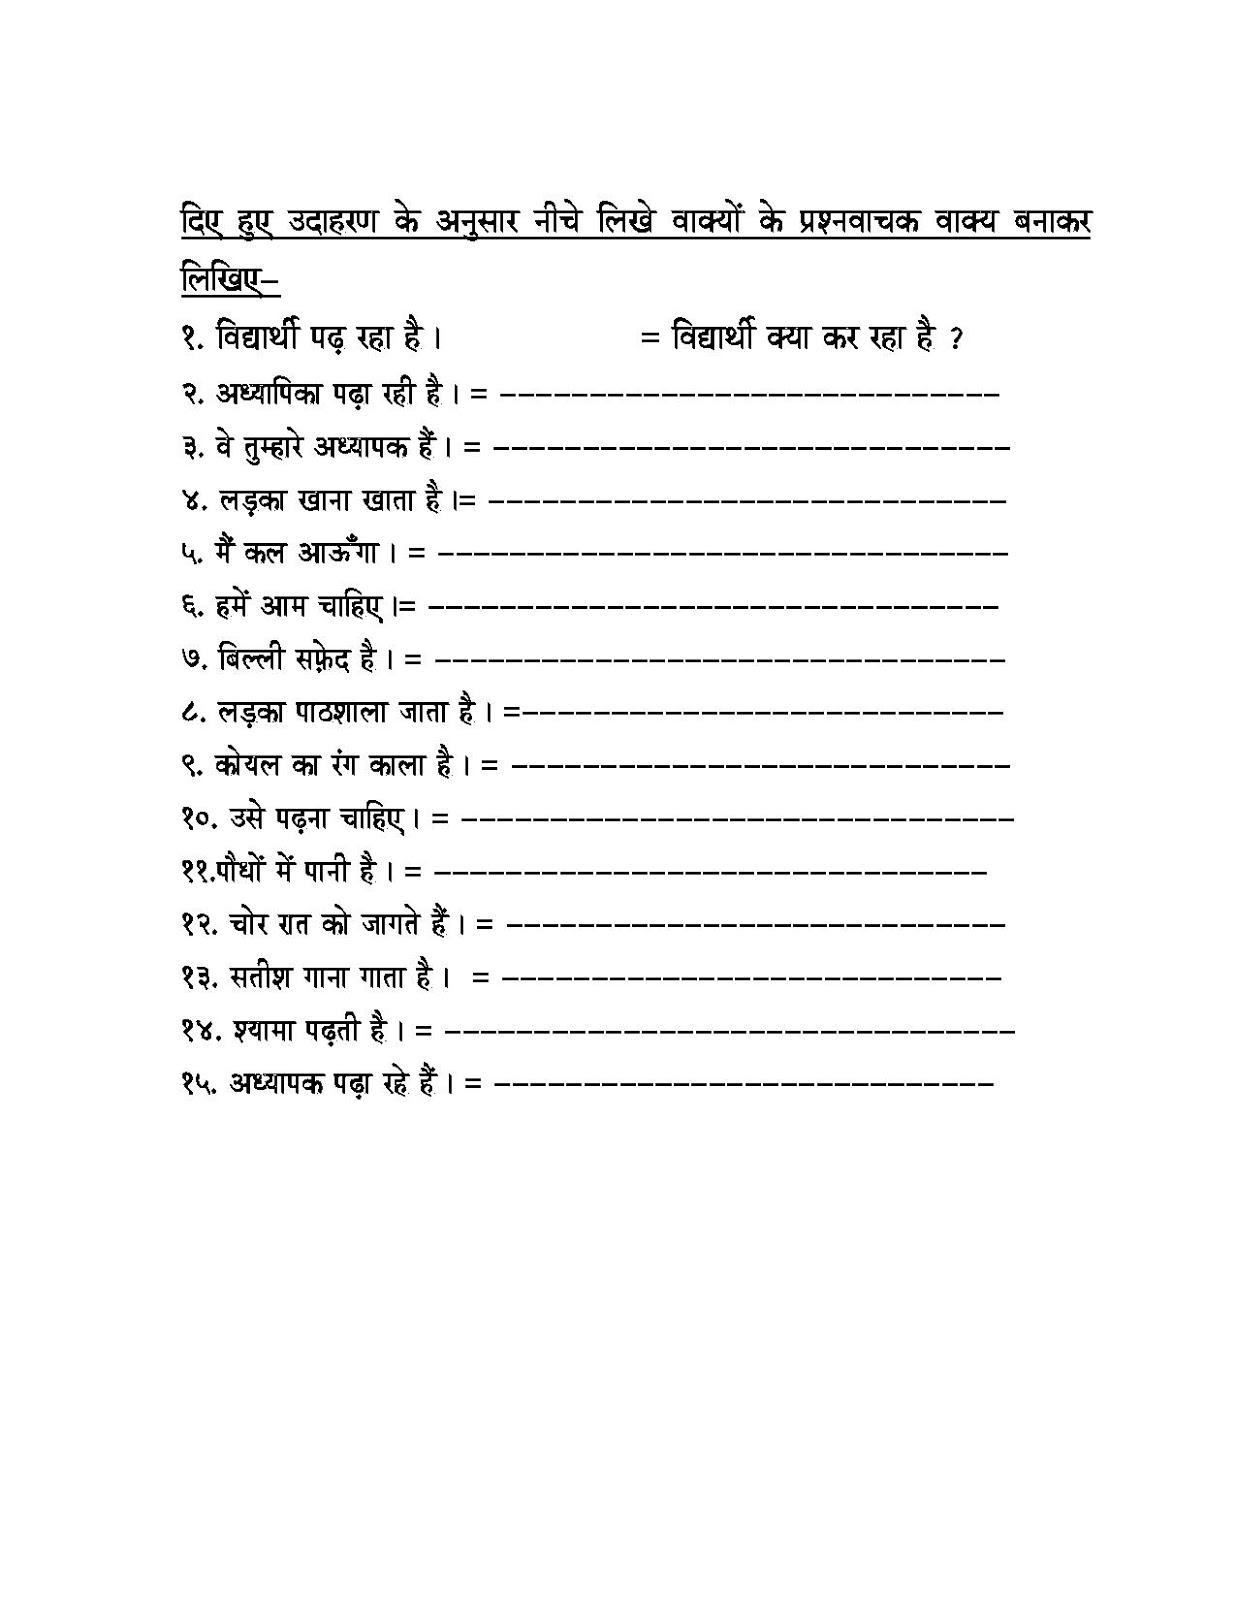 medium resolution of Hindi Grammar Worksheet Class 3   Printable Worksheets and Activities for  Teachers